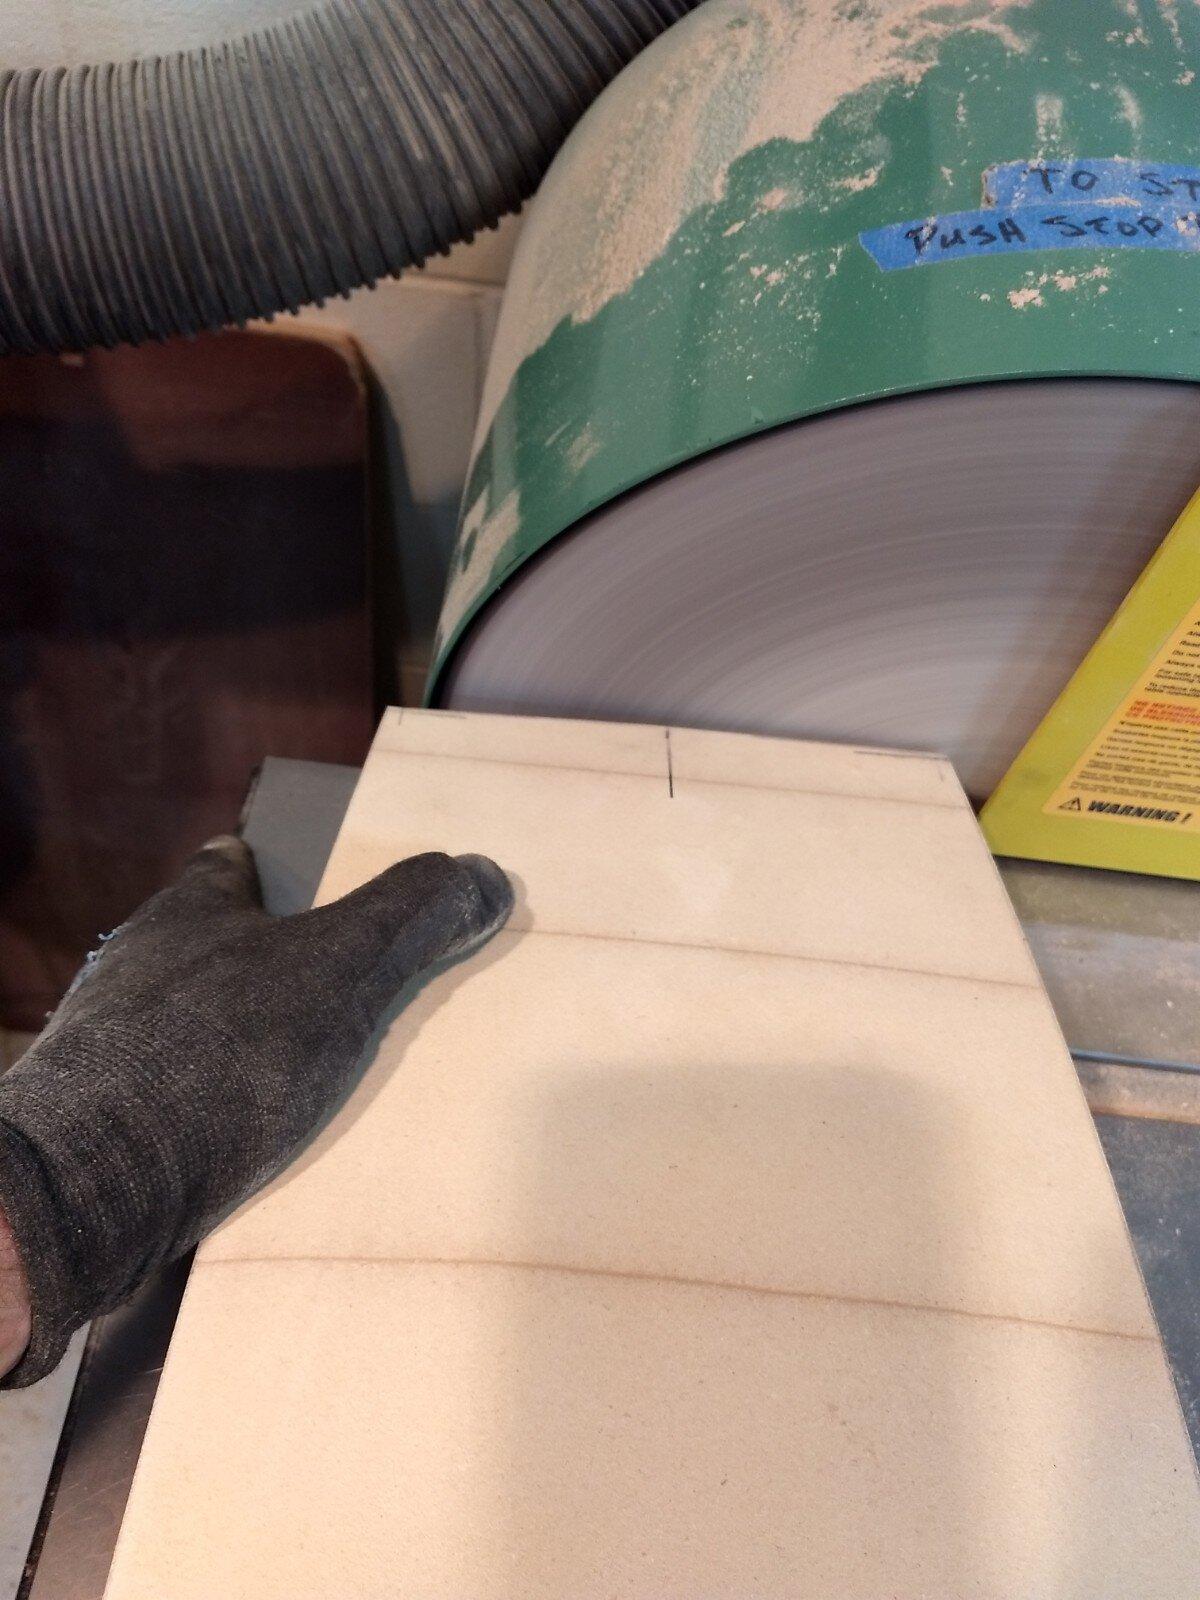 Sanding short arc on disk sander